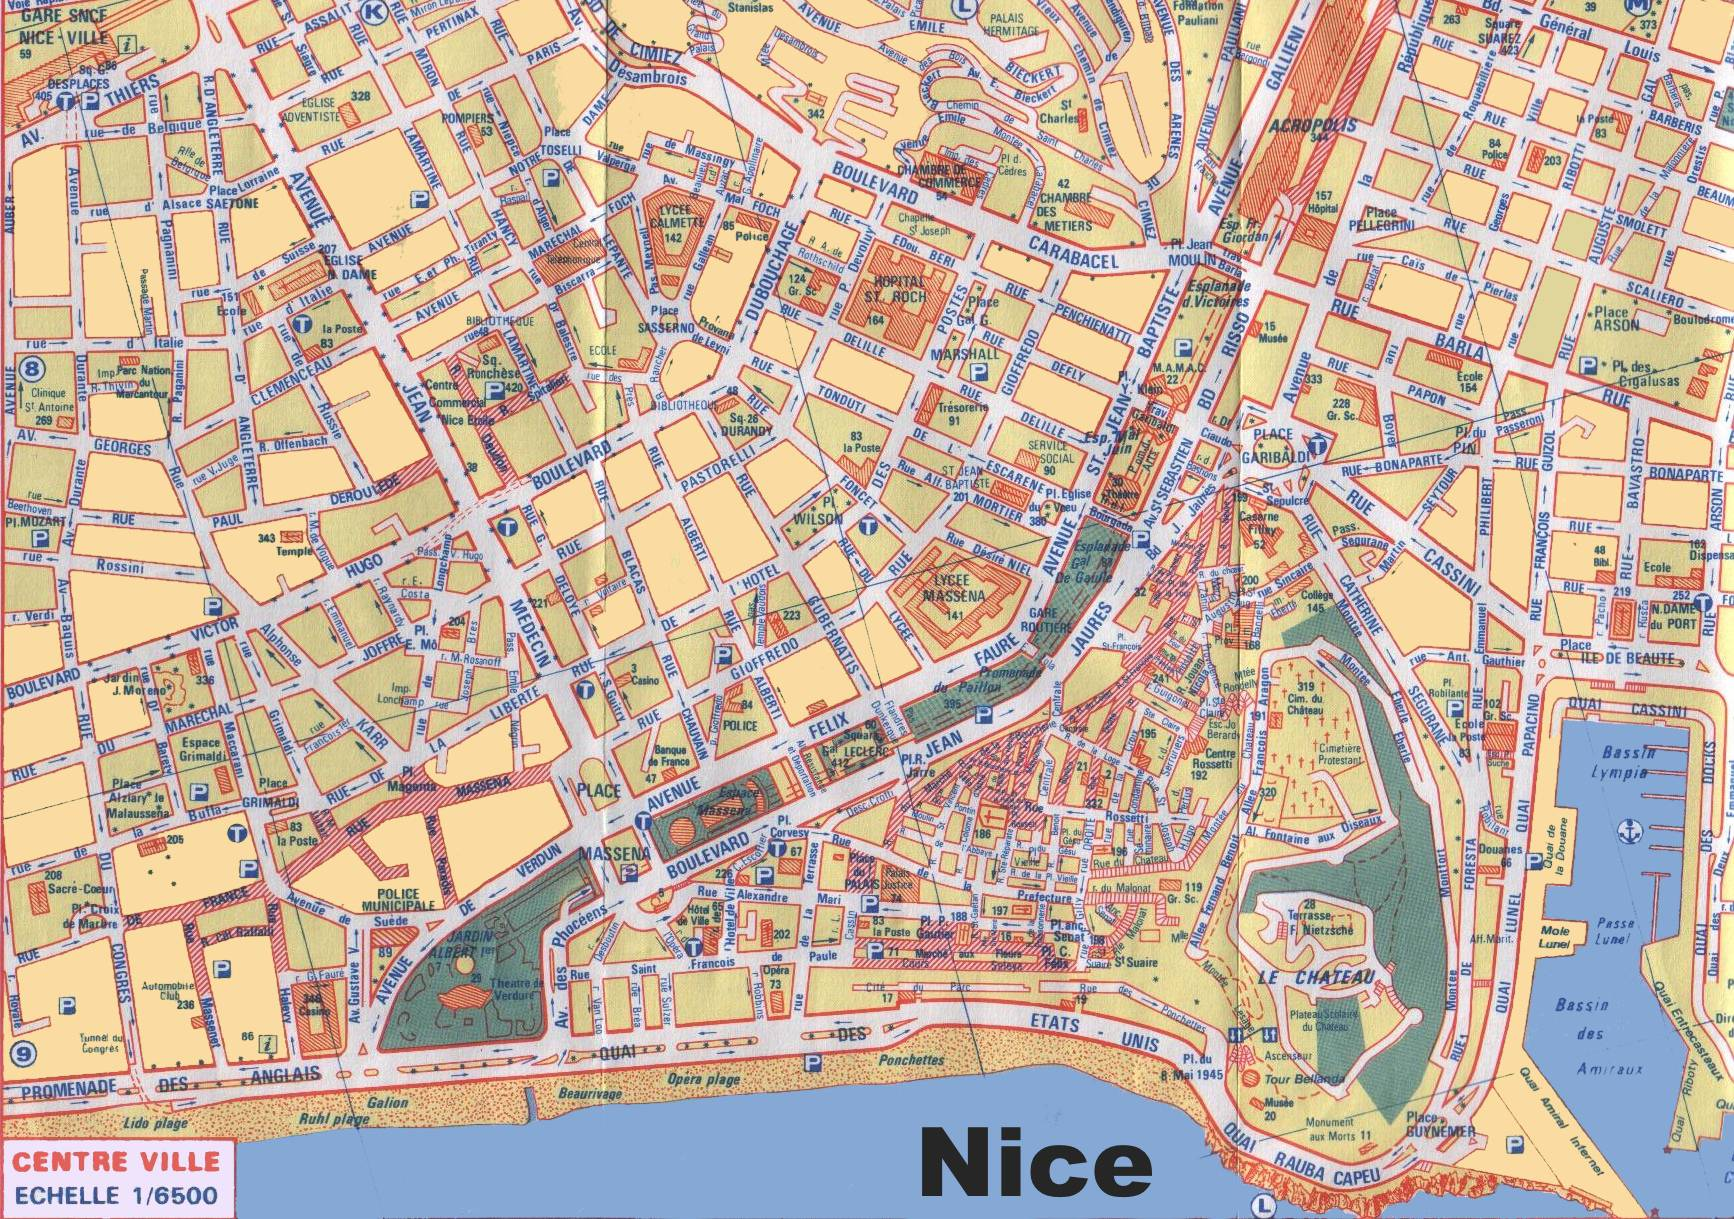 Carte du centre ville de Nice